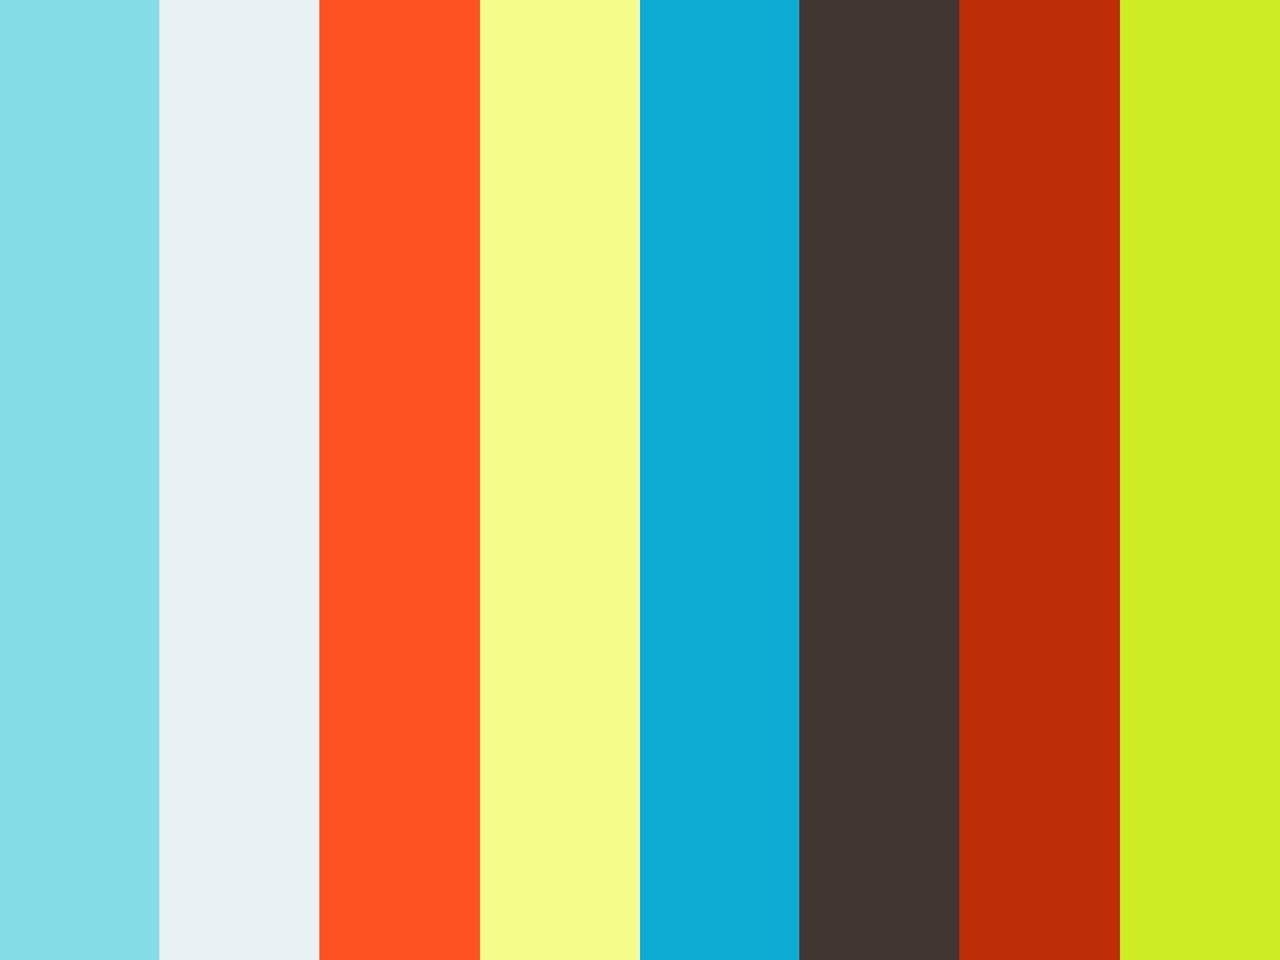 danskina rug rhythms by hella jongerius jongeriuslab on vimeo. Black Bedroom Furniture Sets. Home Design Ideas